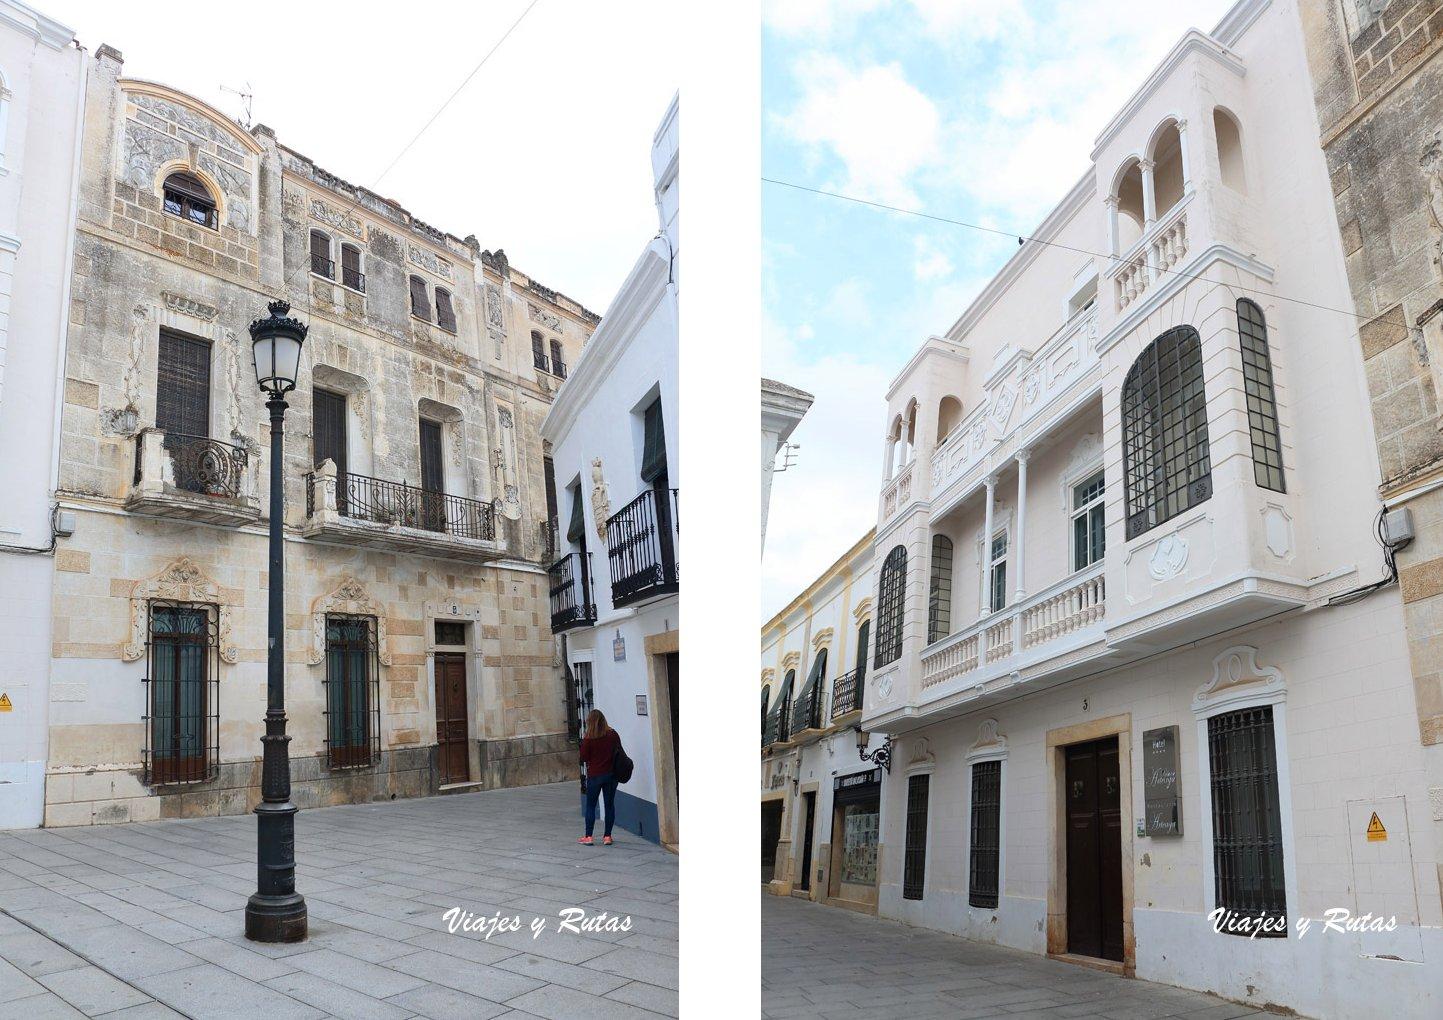 Calle Monero Nieto, Palacio Arteaga, Olivenza